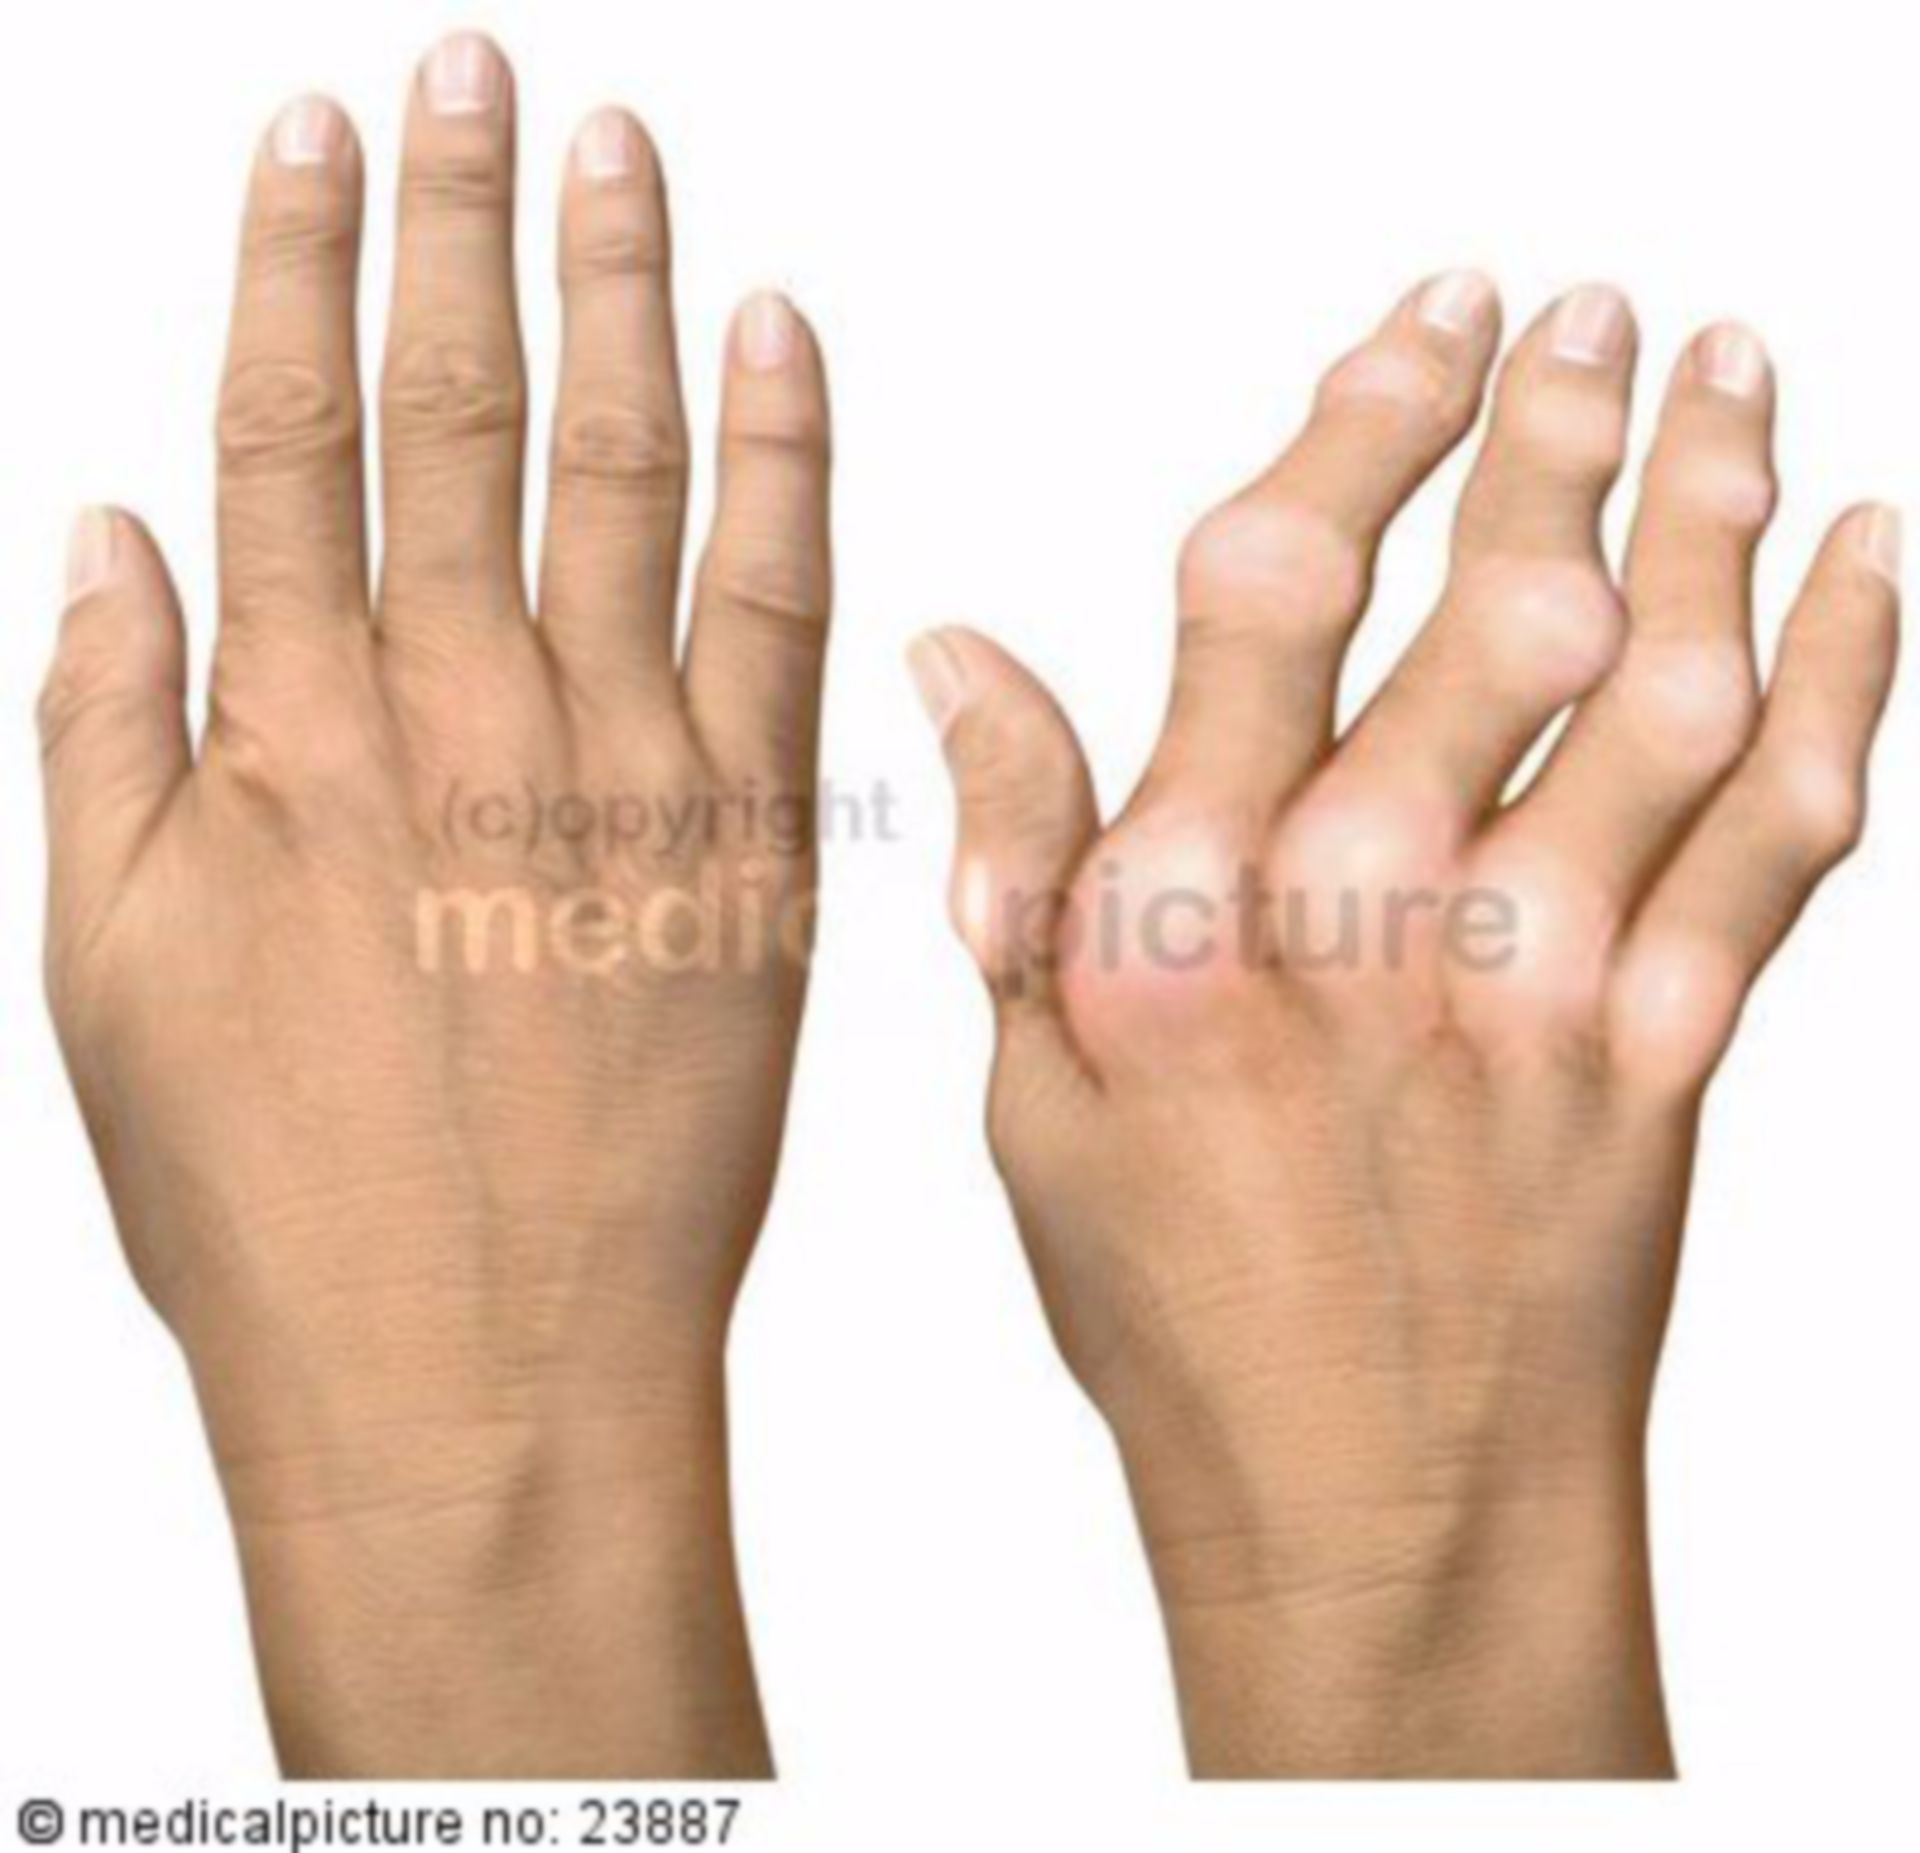 Deformed hand due to rheumatoid arthritis